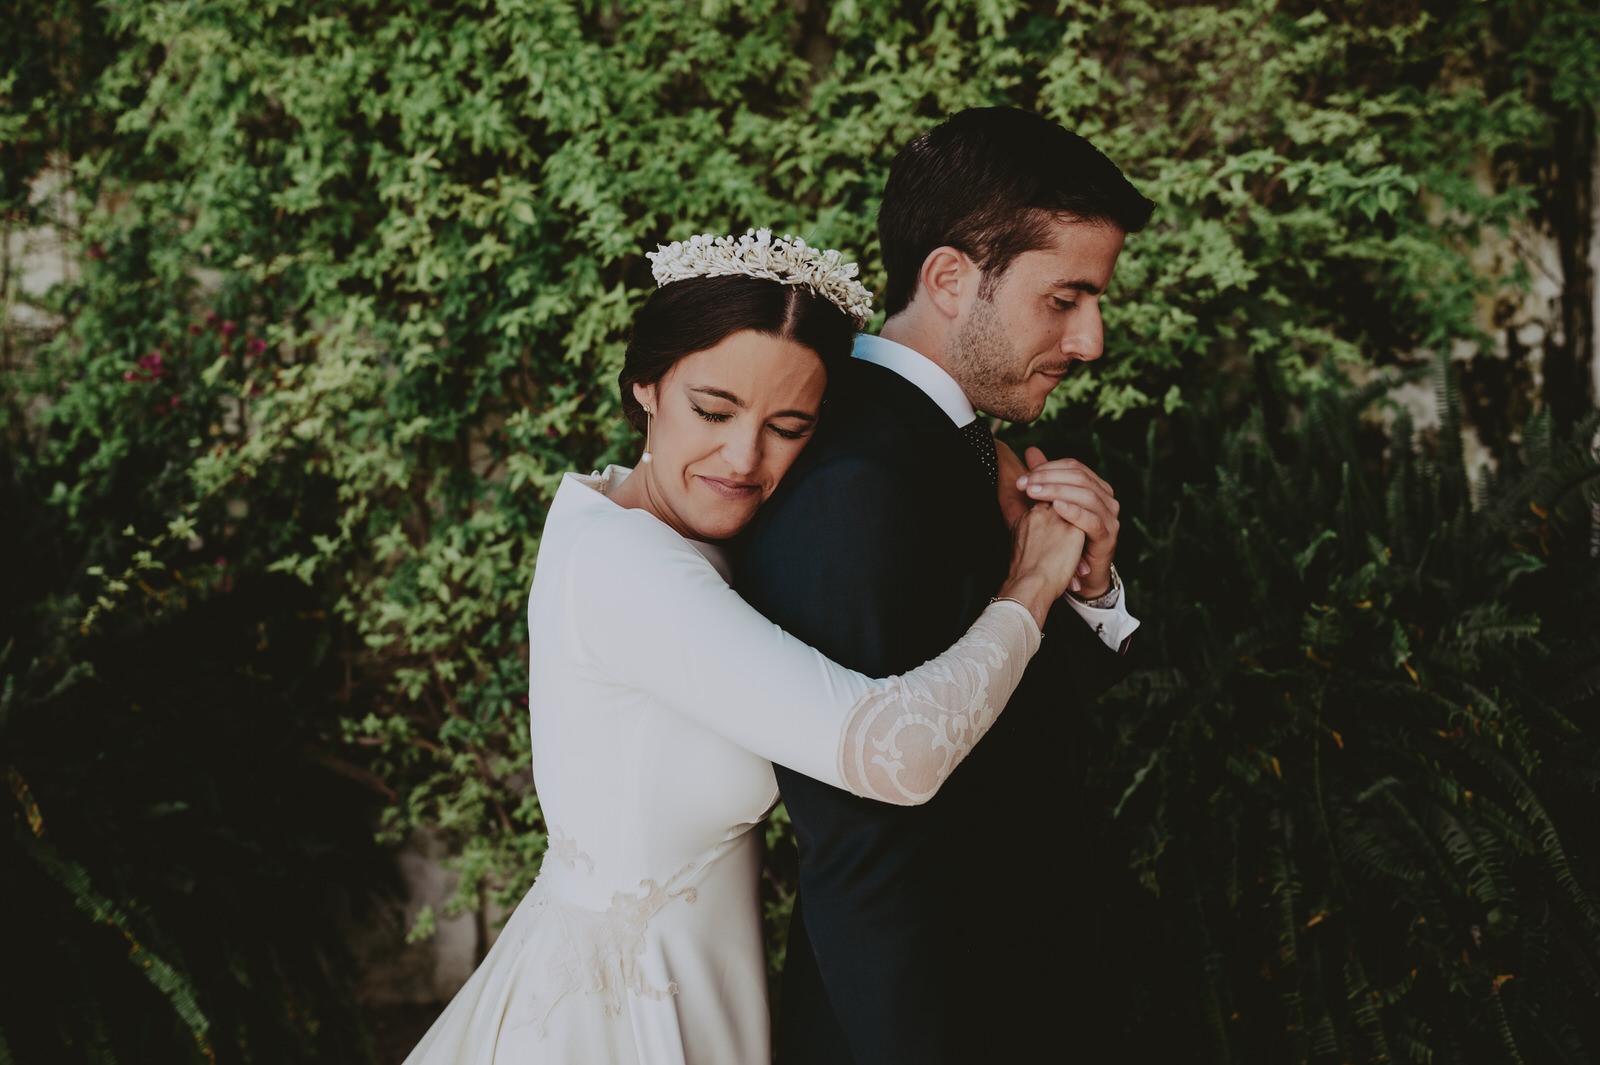 Judith & Gabriel - Boda en Olivares - Albaida, Fotógrafo de boda Andrés Amarillo - 42.JPG